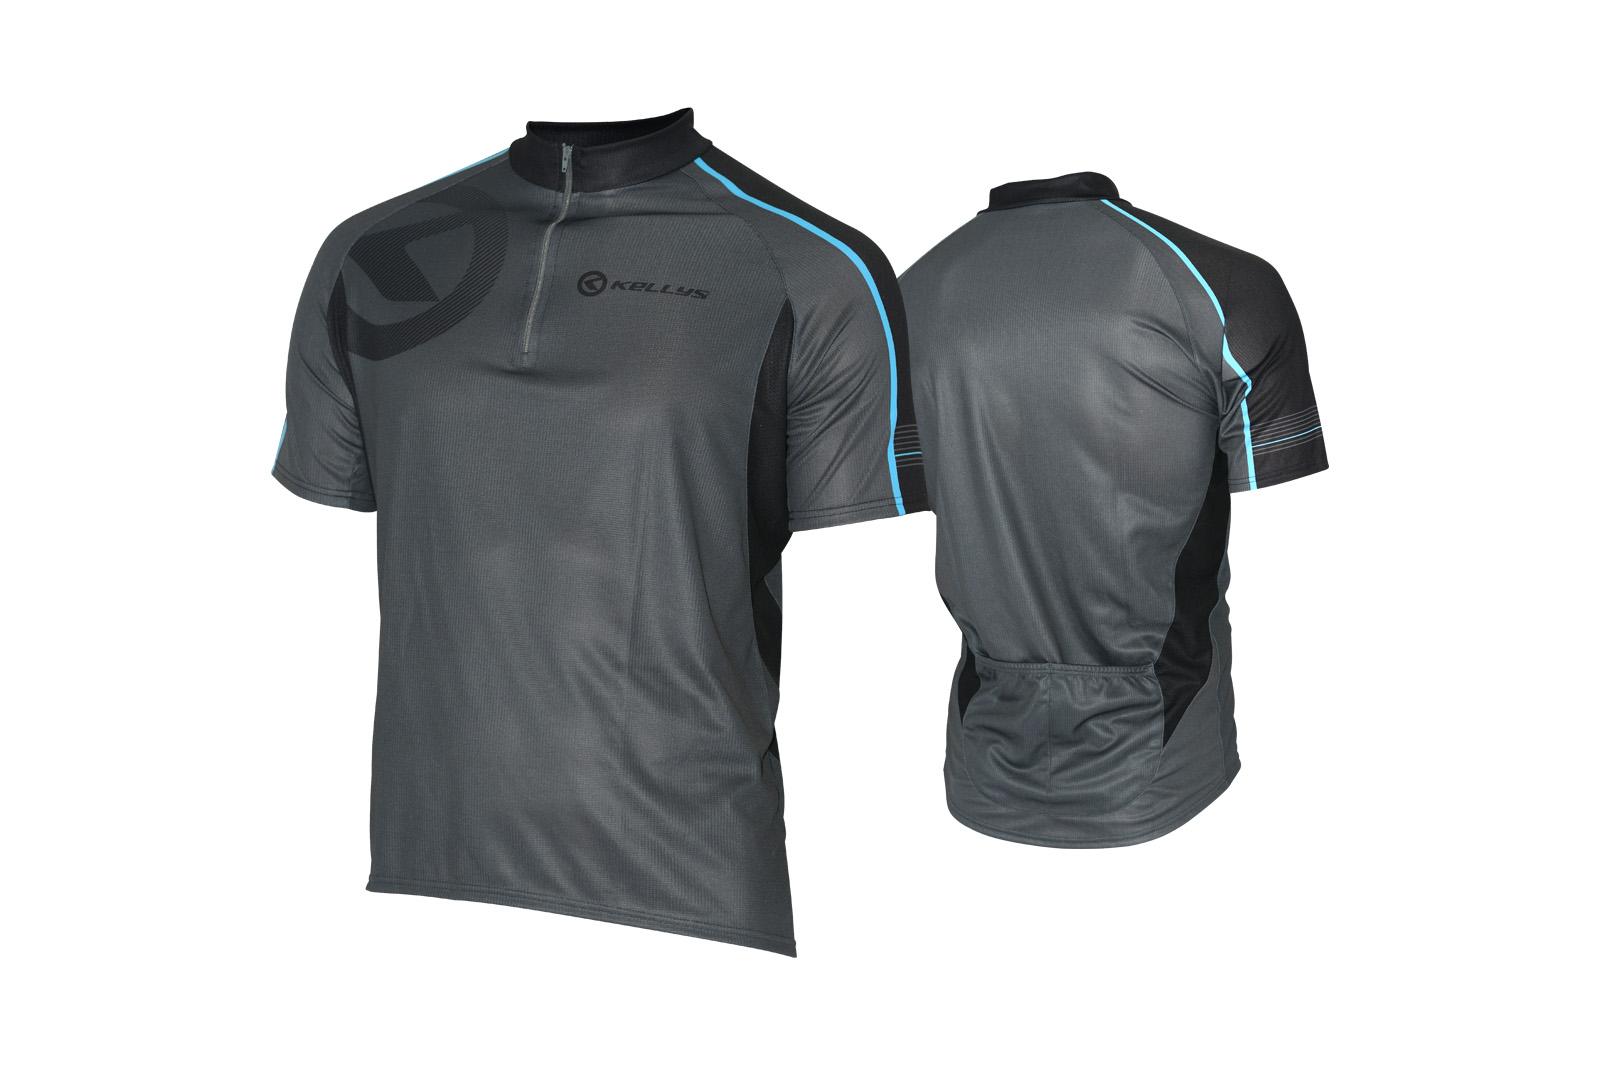 Pánský dres KELLYS PRO Sport, vel. XXL, šedo-modrá, krátký rukáv (Pánský cyklistický dres KELLYS, vel. XXL, krátký rukáv, barva šedá/modrá dle vyobrazení!)